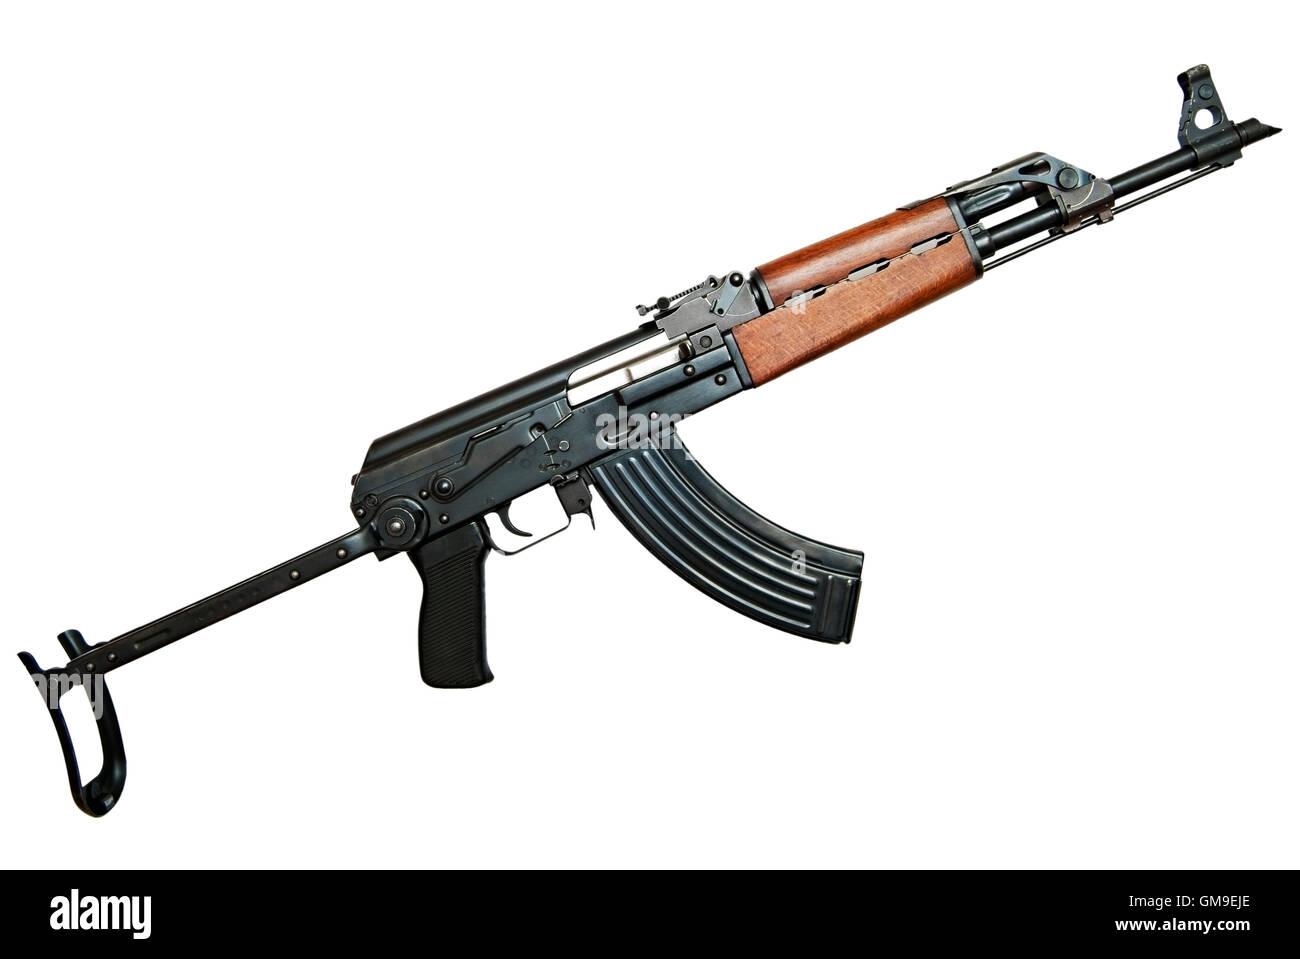 AK47 AKMS Kalashnikov Assault Rifle Against a White Background.